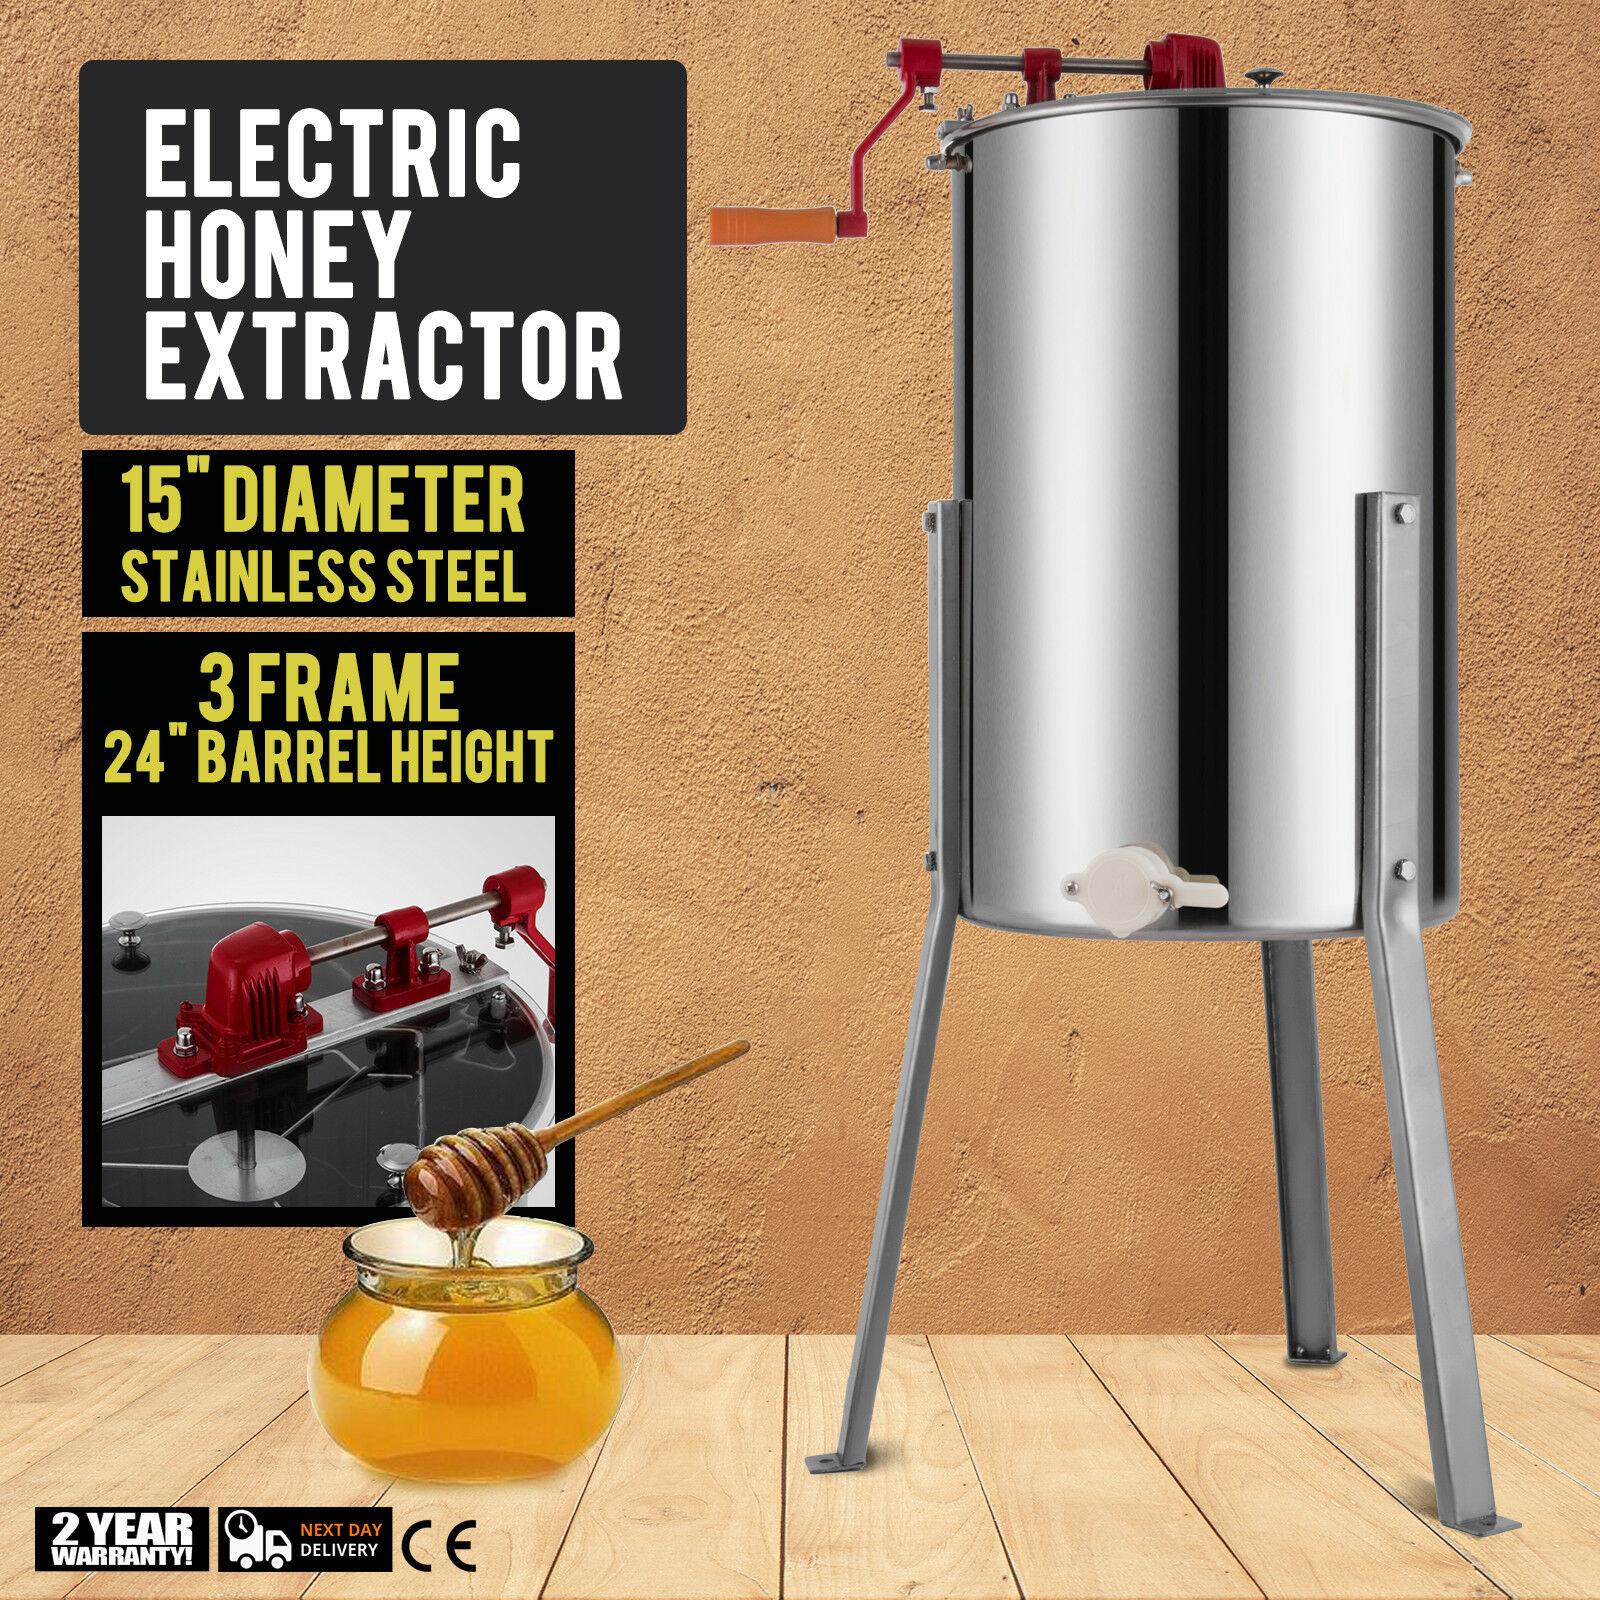 Tambour manuel de nid dabeilles déquipement dapiculture dextracteur de miel dacier inoxydable de 3 cadres